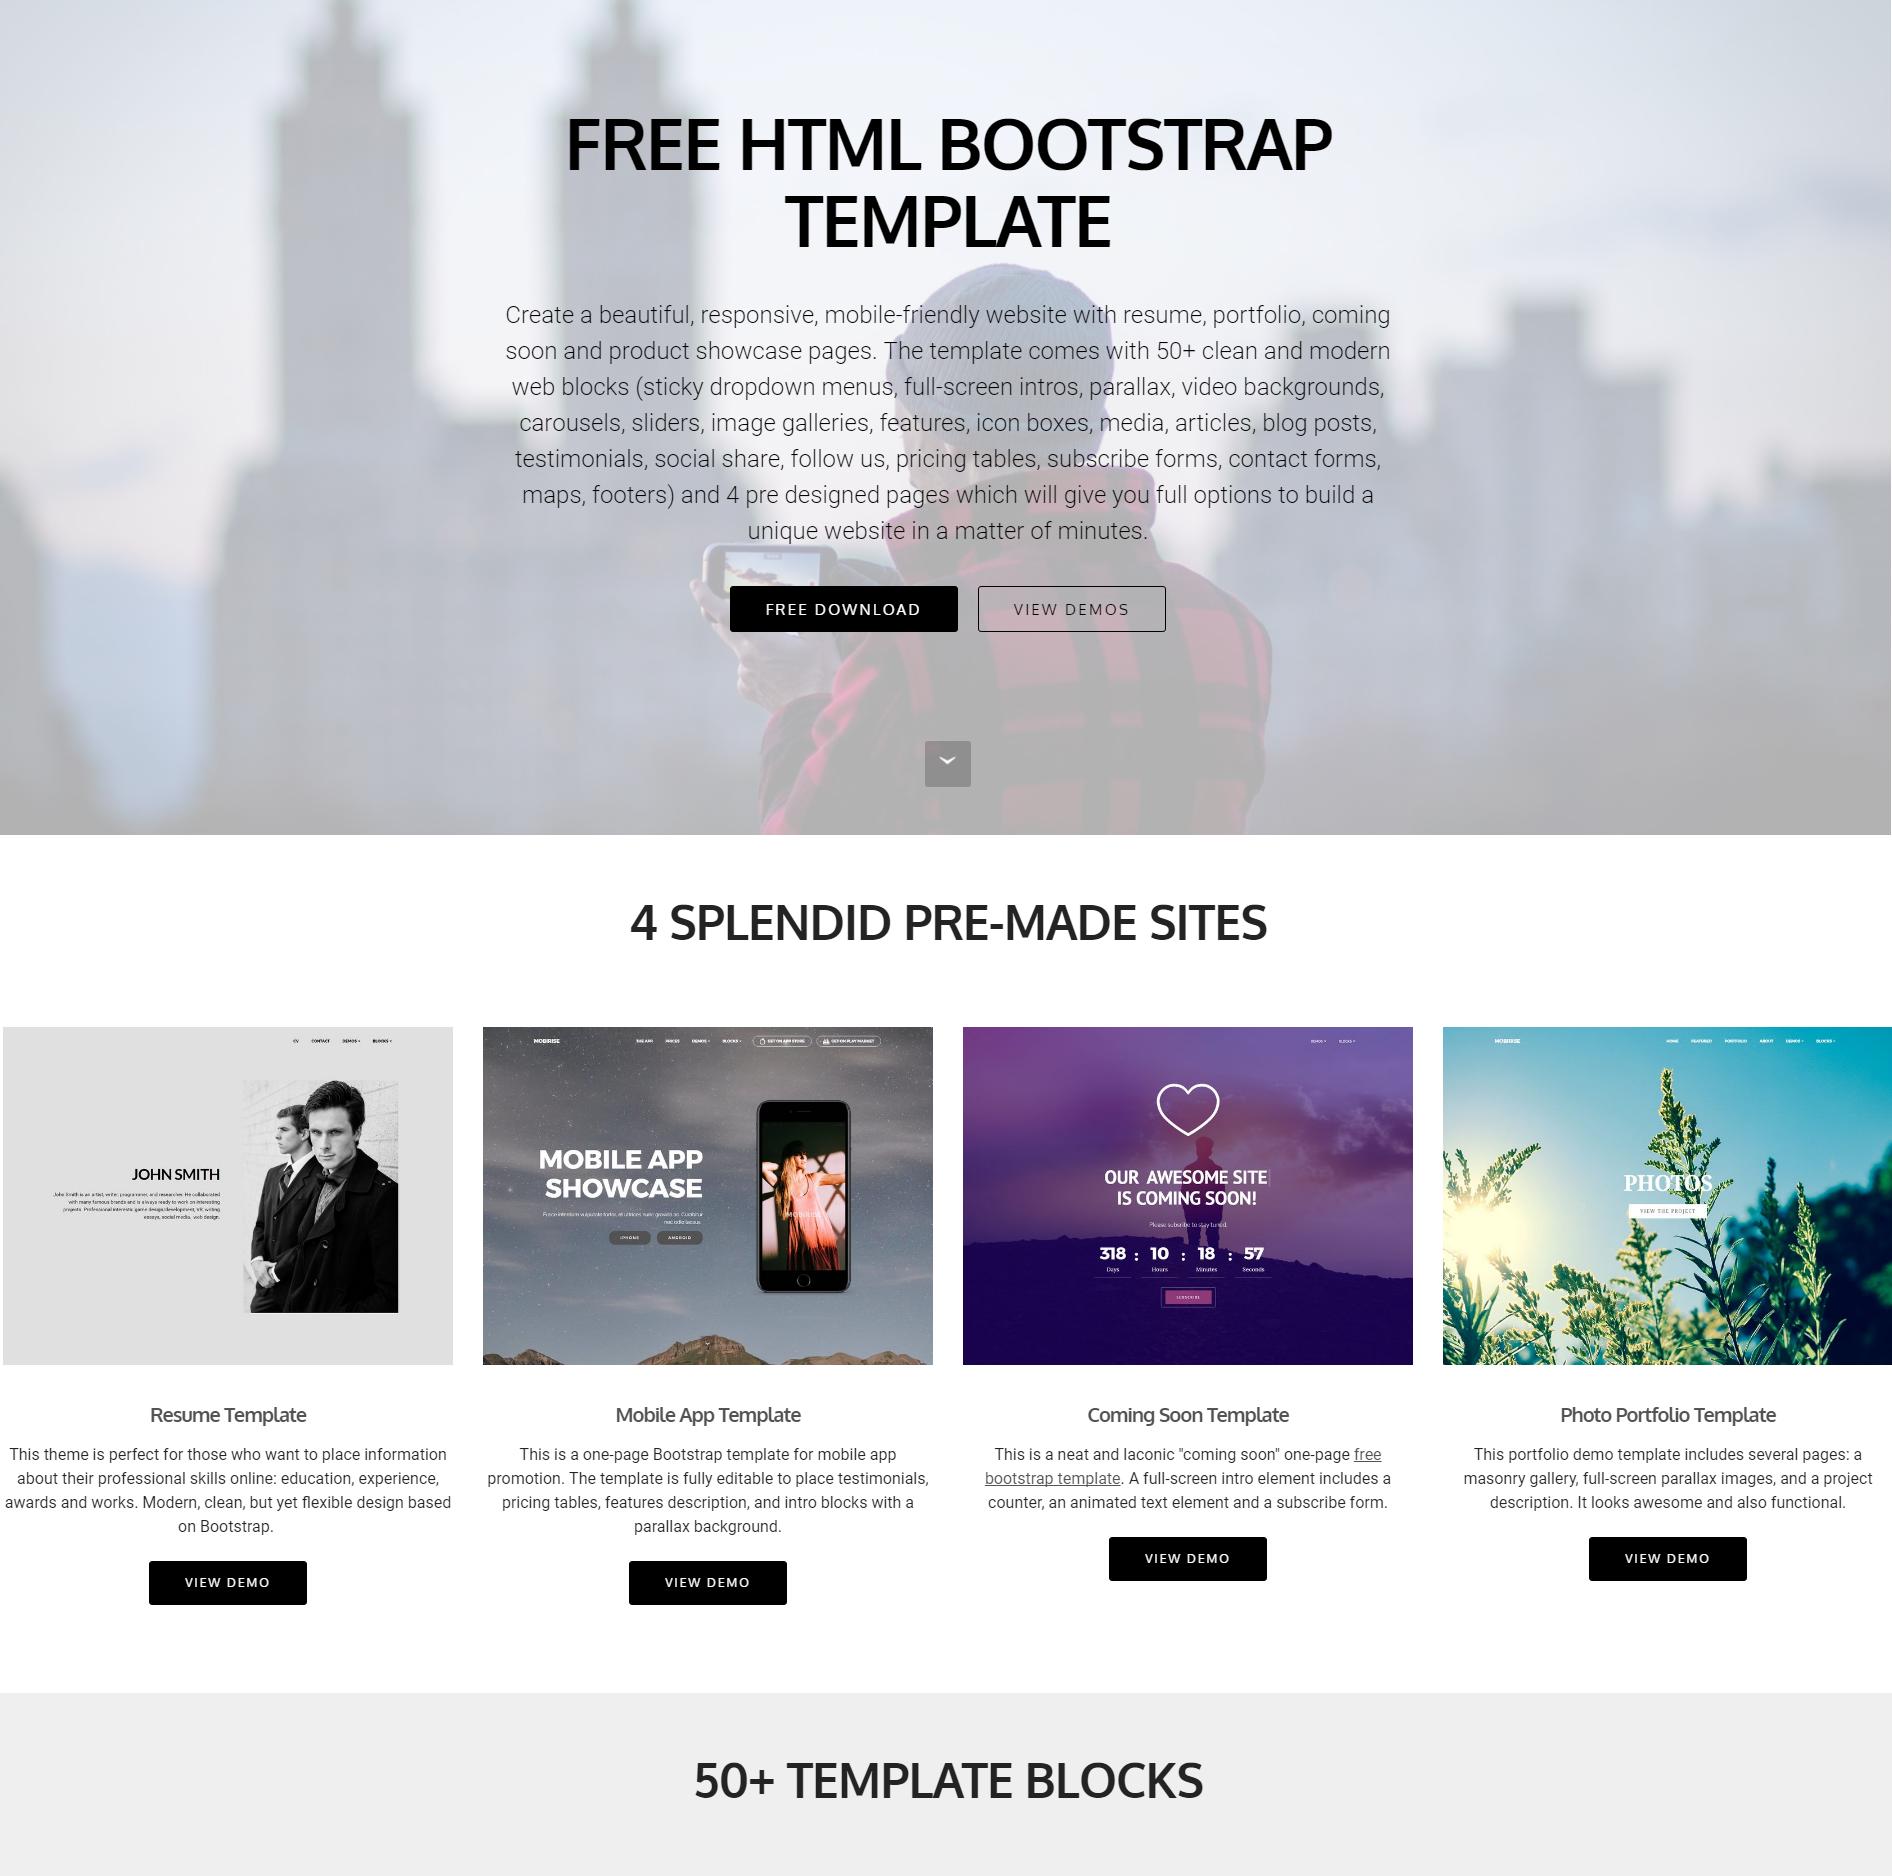 HTML5 Bootstrap 4 Blocks Themes